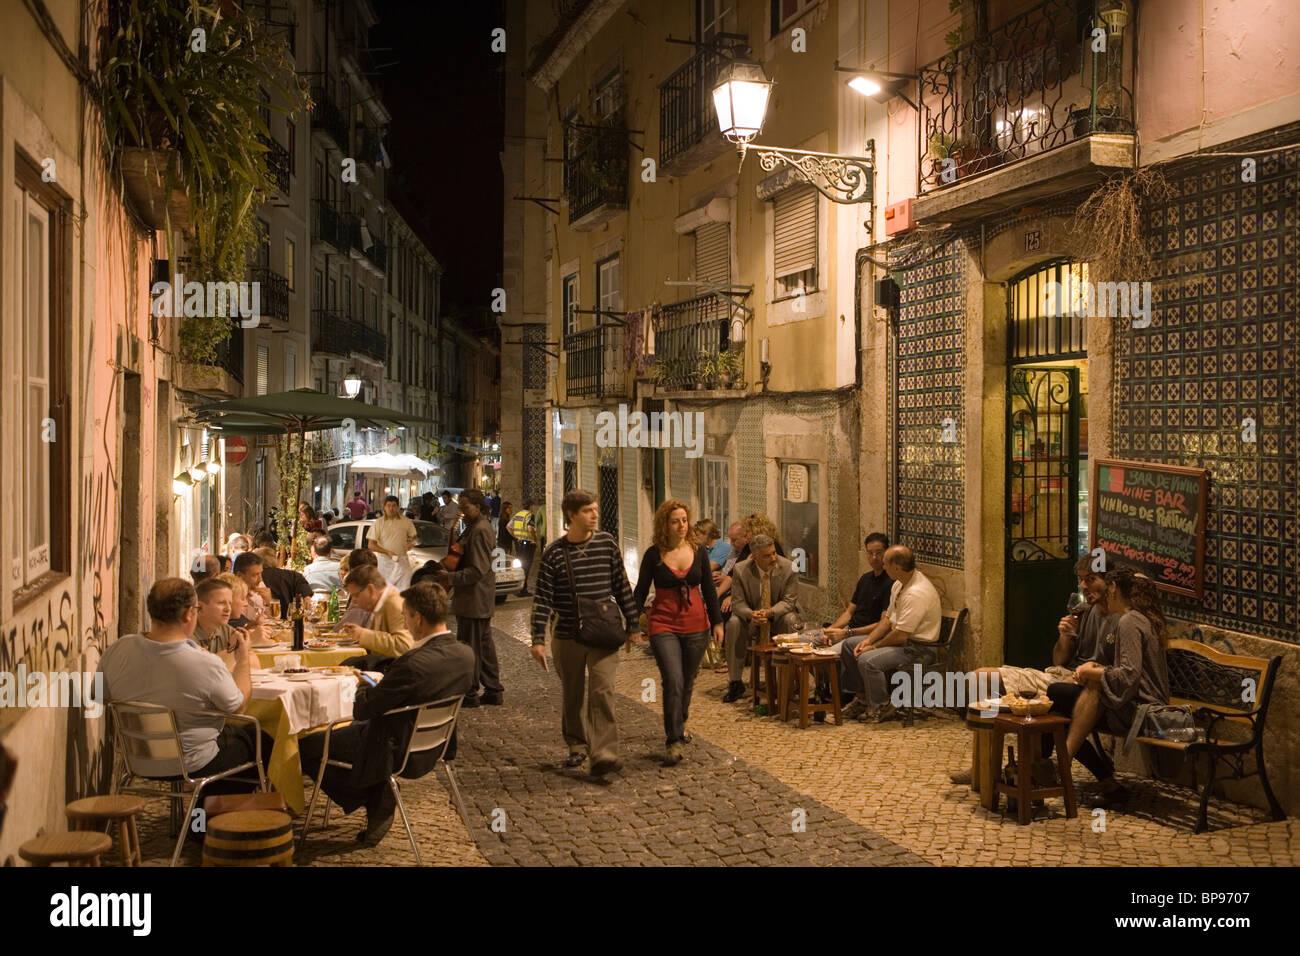 People outside the Alfaia Wine Bar in Bairro Alta District, Lisbon, Lisboa, Portugal, Europe - Stock Image